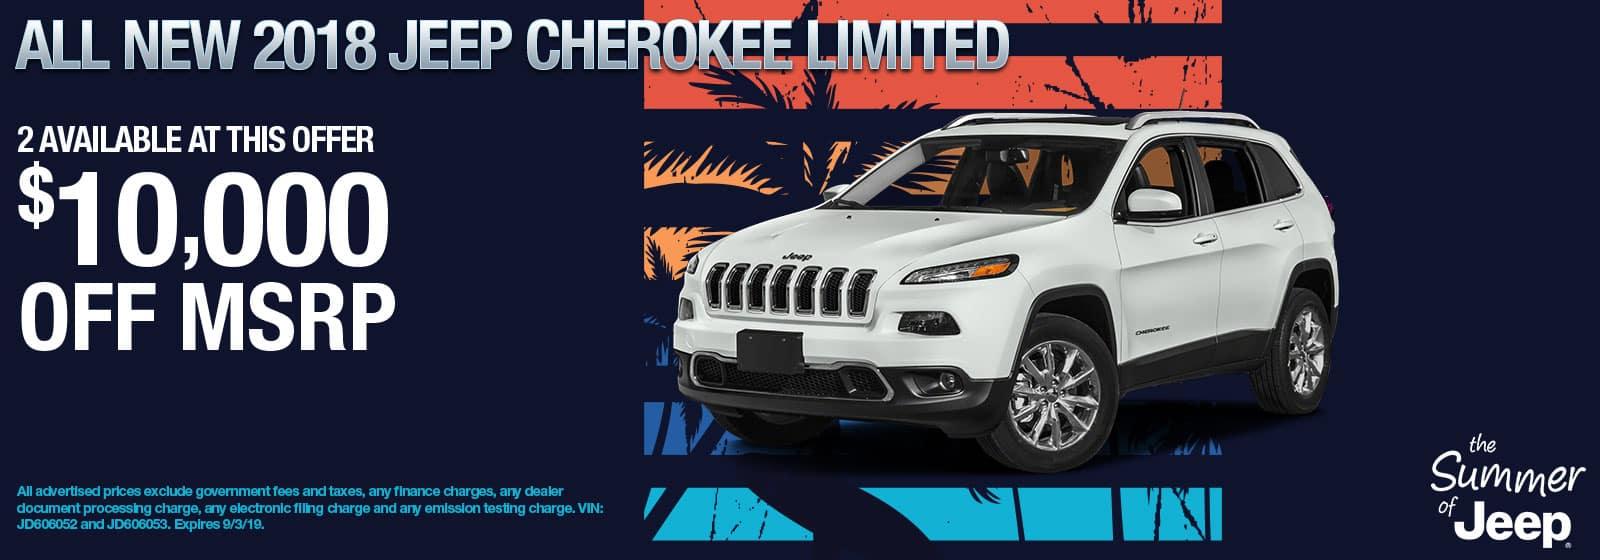 Jeep Dealership San Diego >> Kearny Mesa Chrysler Dodge Jeep Ram New Used Cars Dealer In San